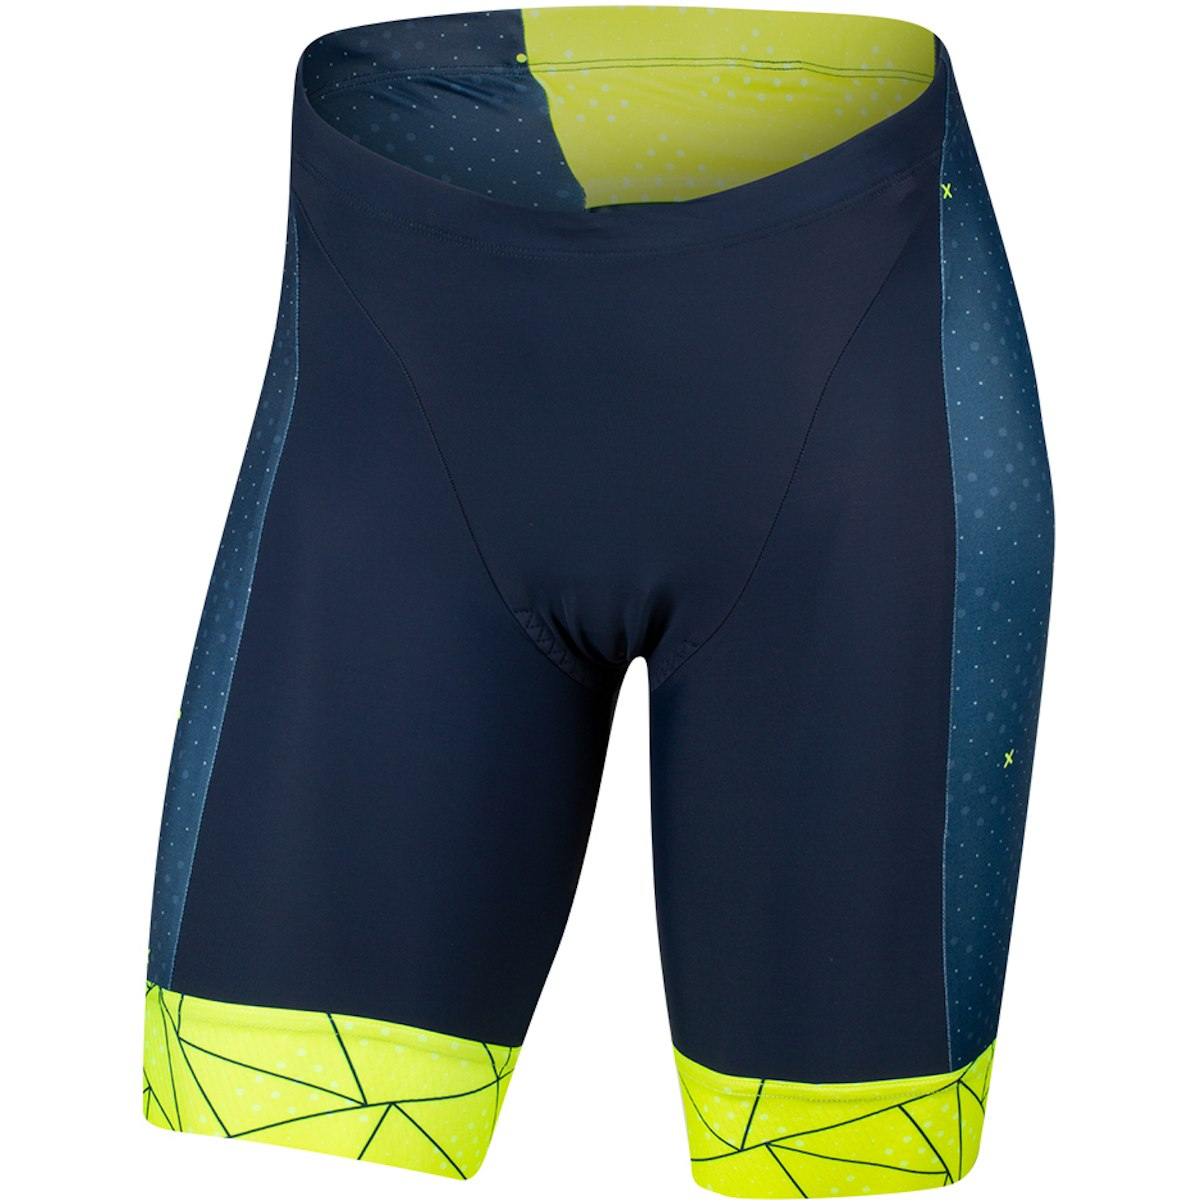 Foto de PEARL iZUMi ELITE Graphic Triatlón Pantalones cortos 13111901 - navy / screaming yellow perplex - 6YS